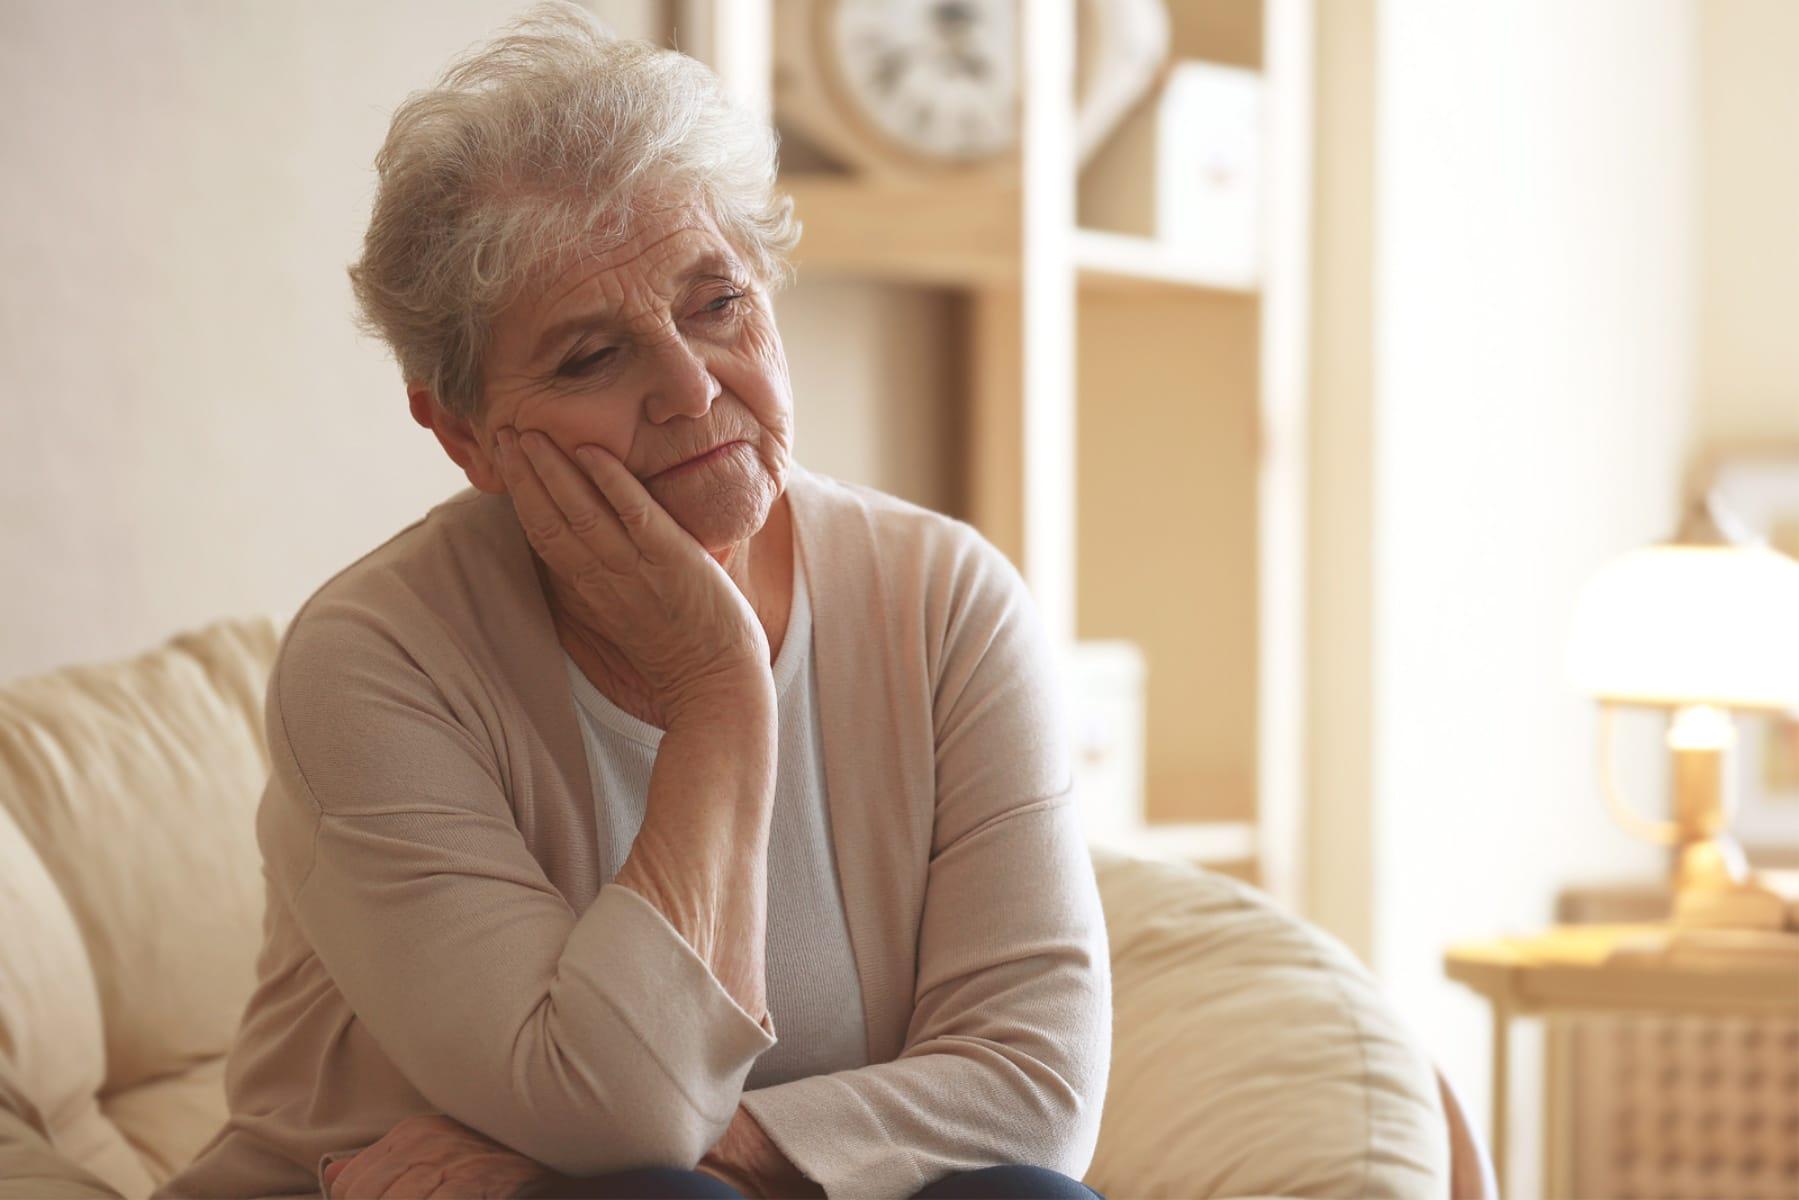 Home Care in Oakwood GA: Seasonal Affective Disorder Impacts